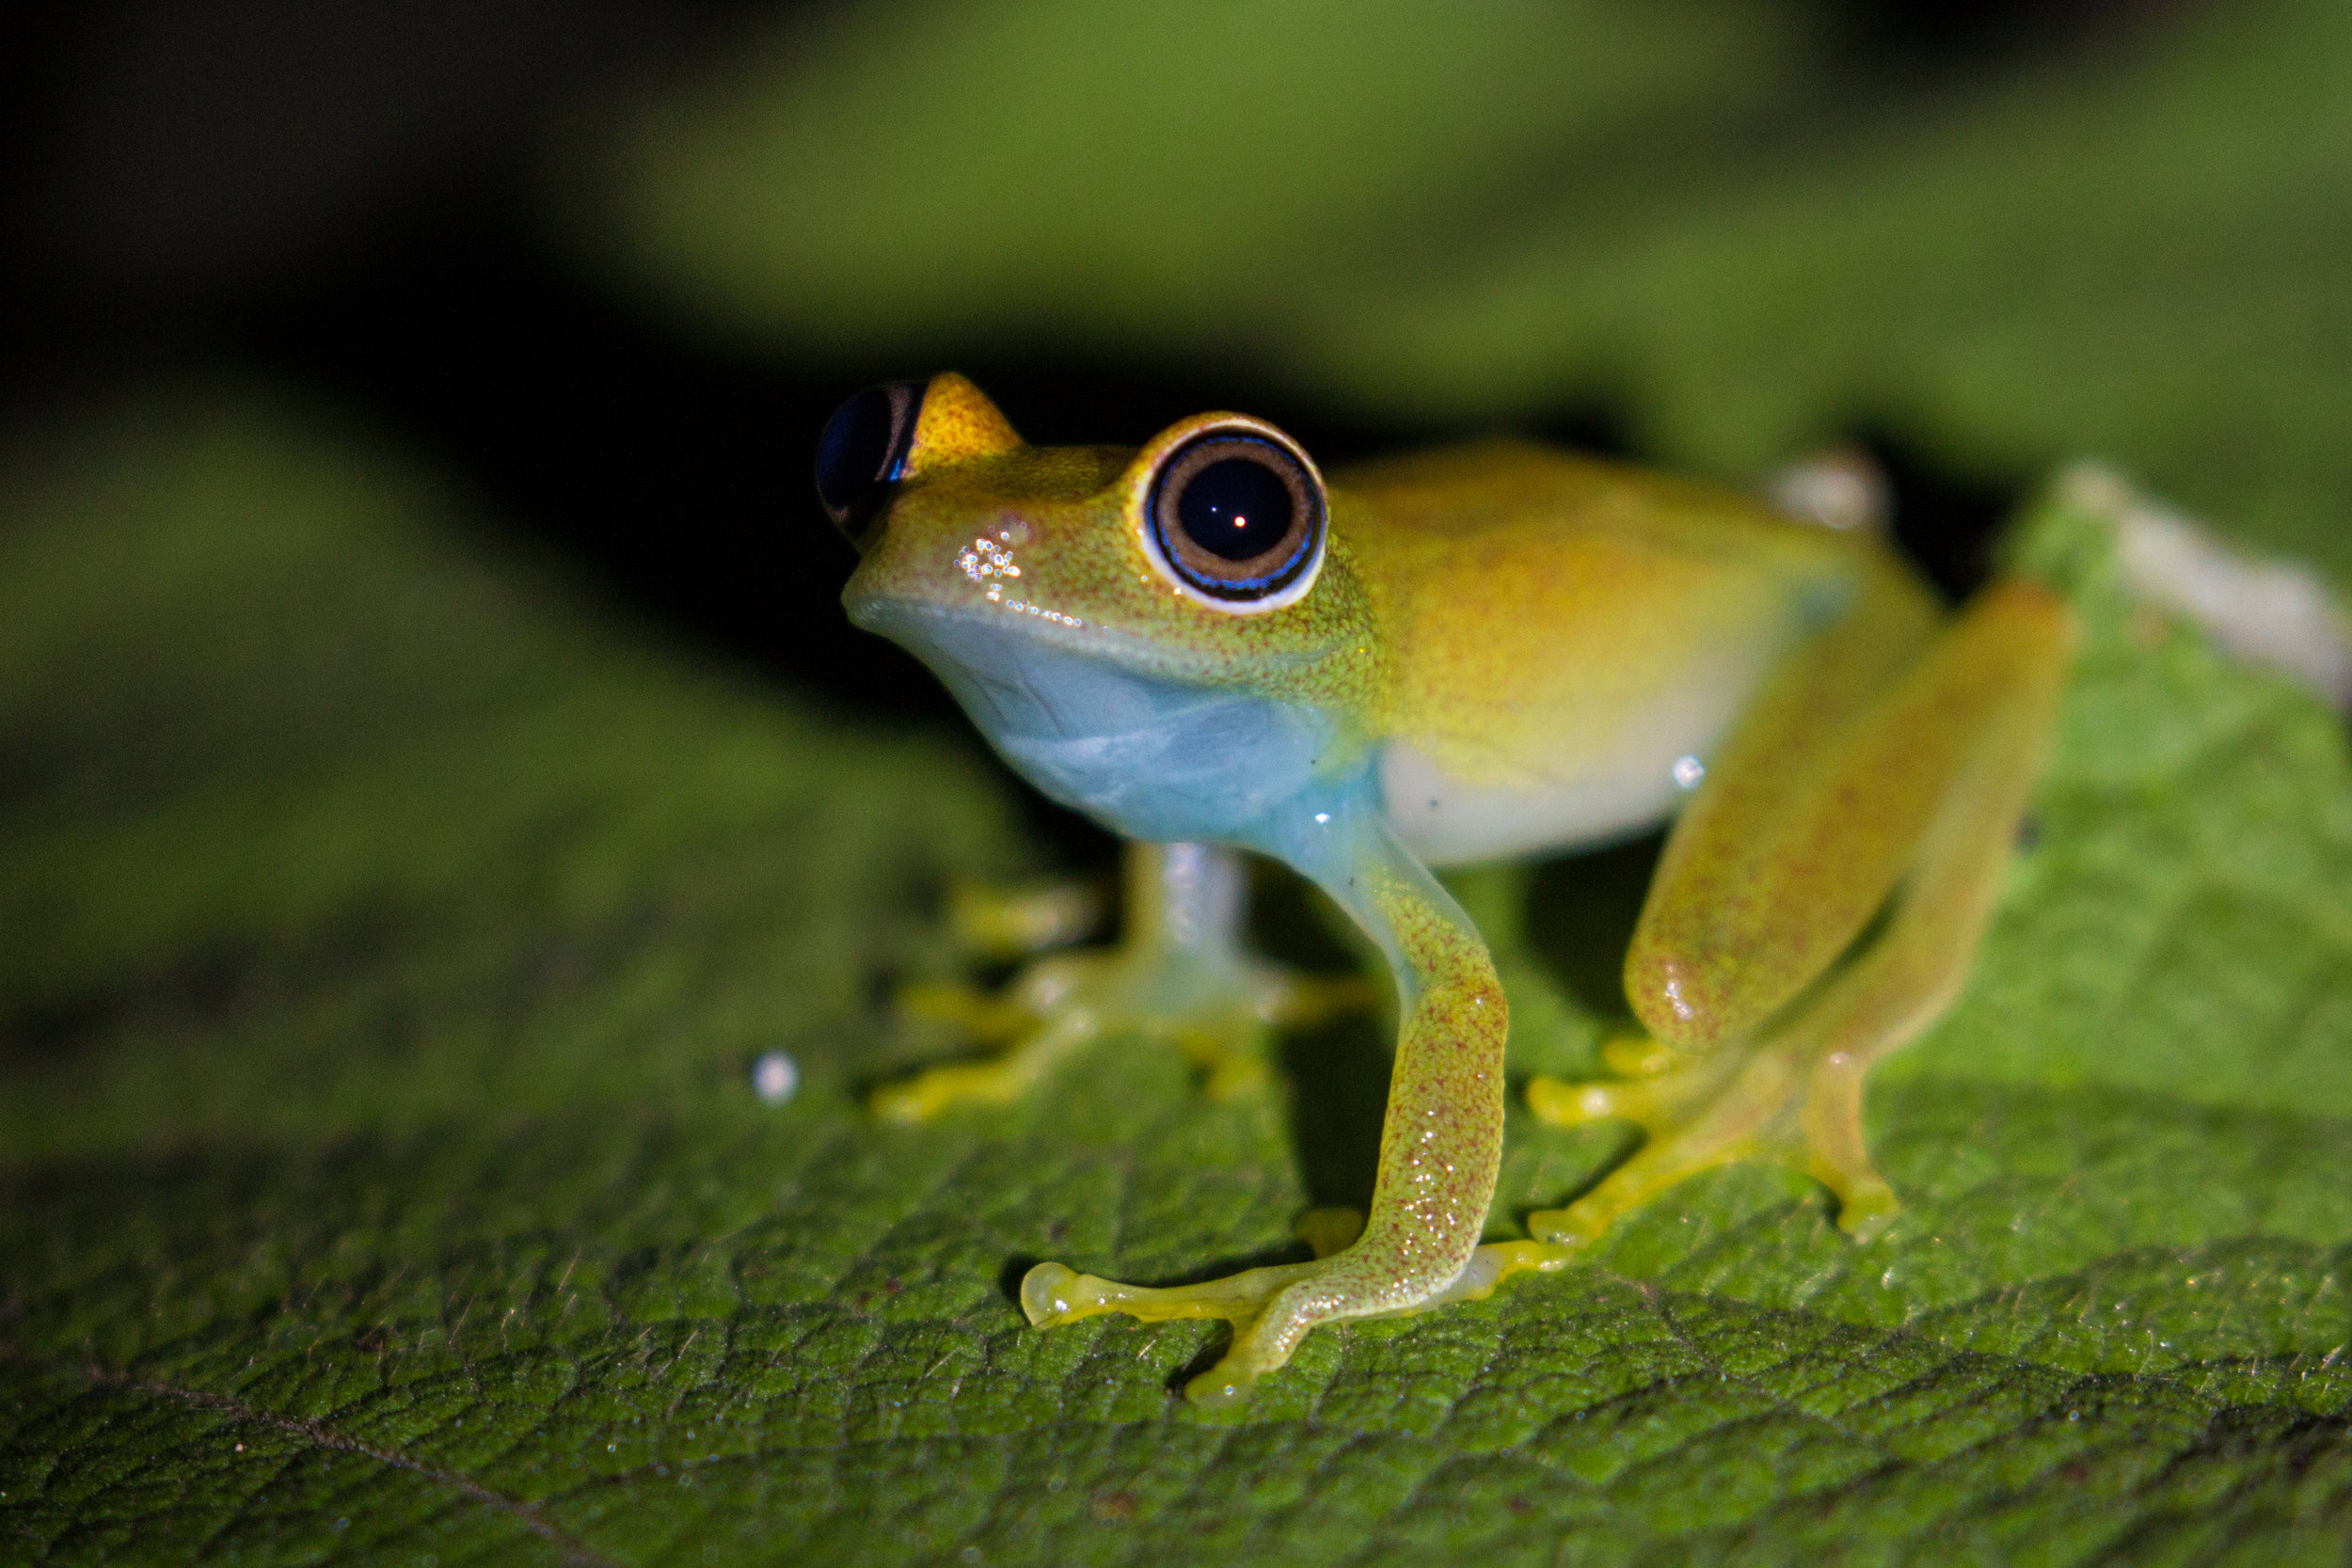 Frog at night.jpg